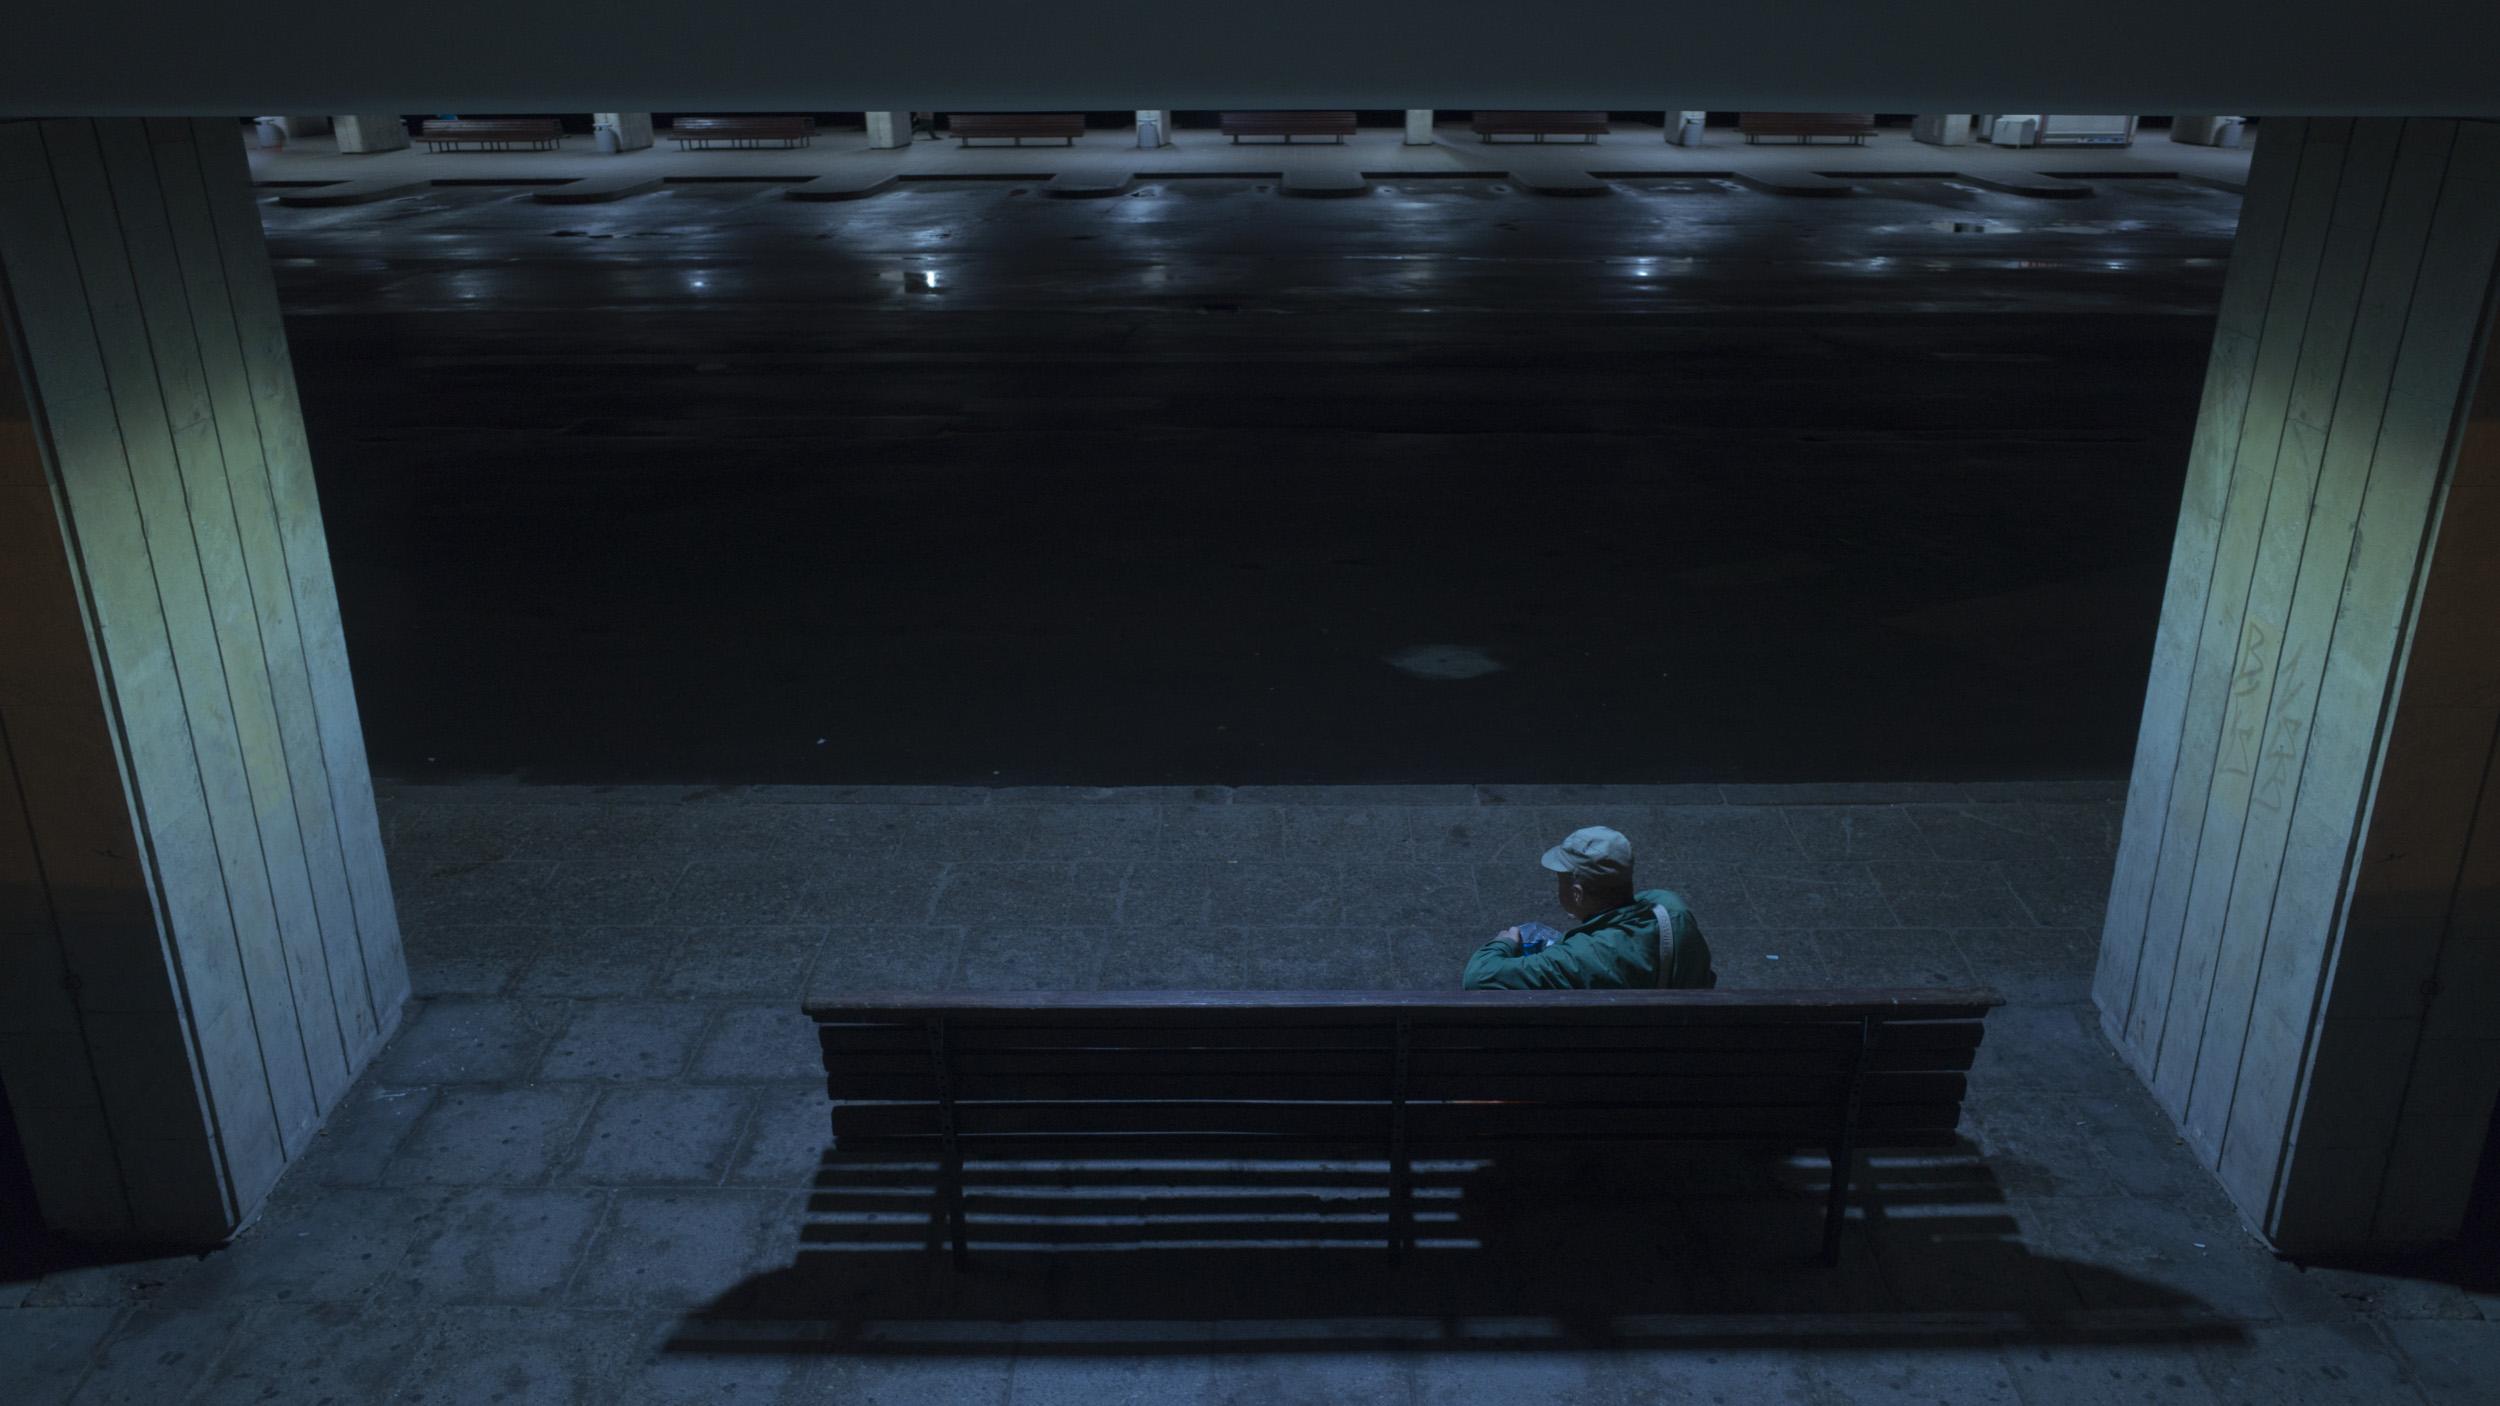 bus station by jevgenij tichonov.jpg